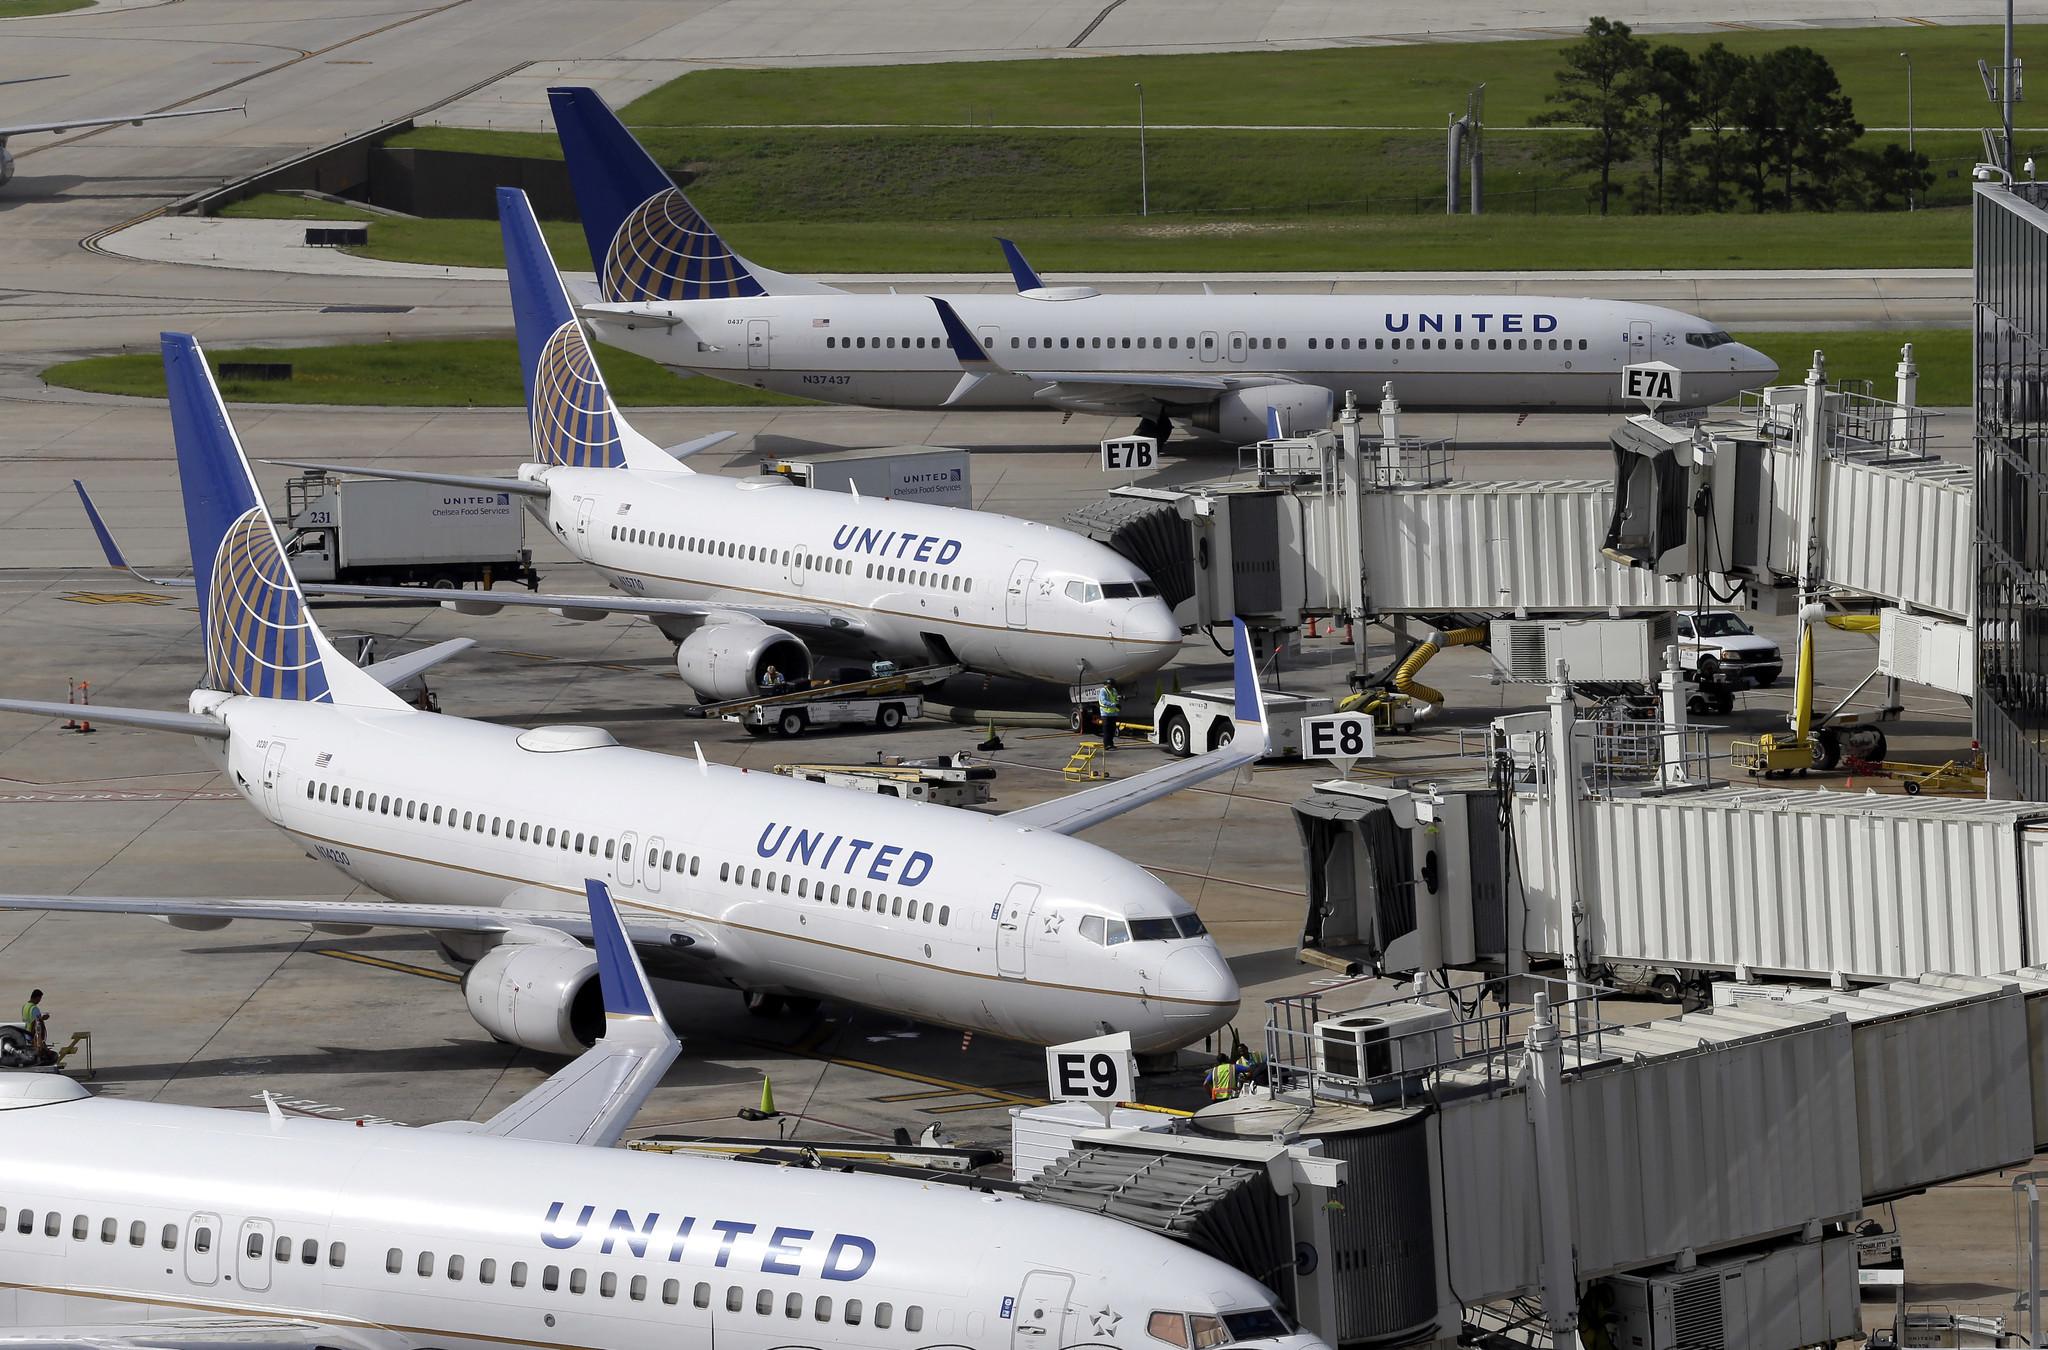 United apologizes to passenger who says U.S. representative took her seat